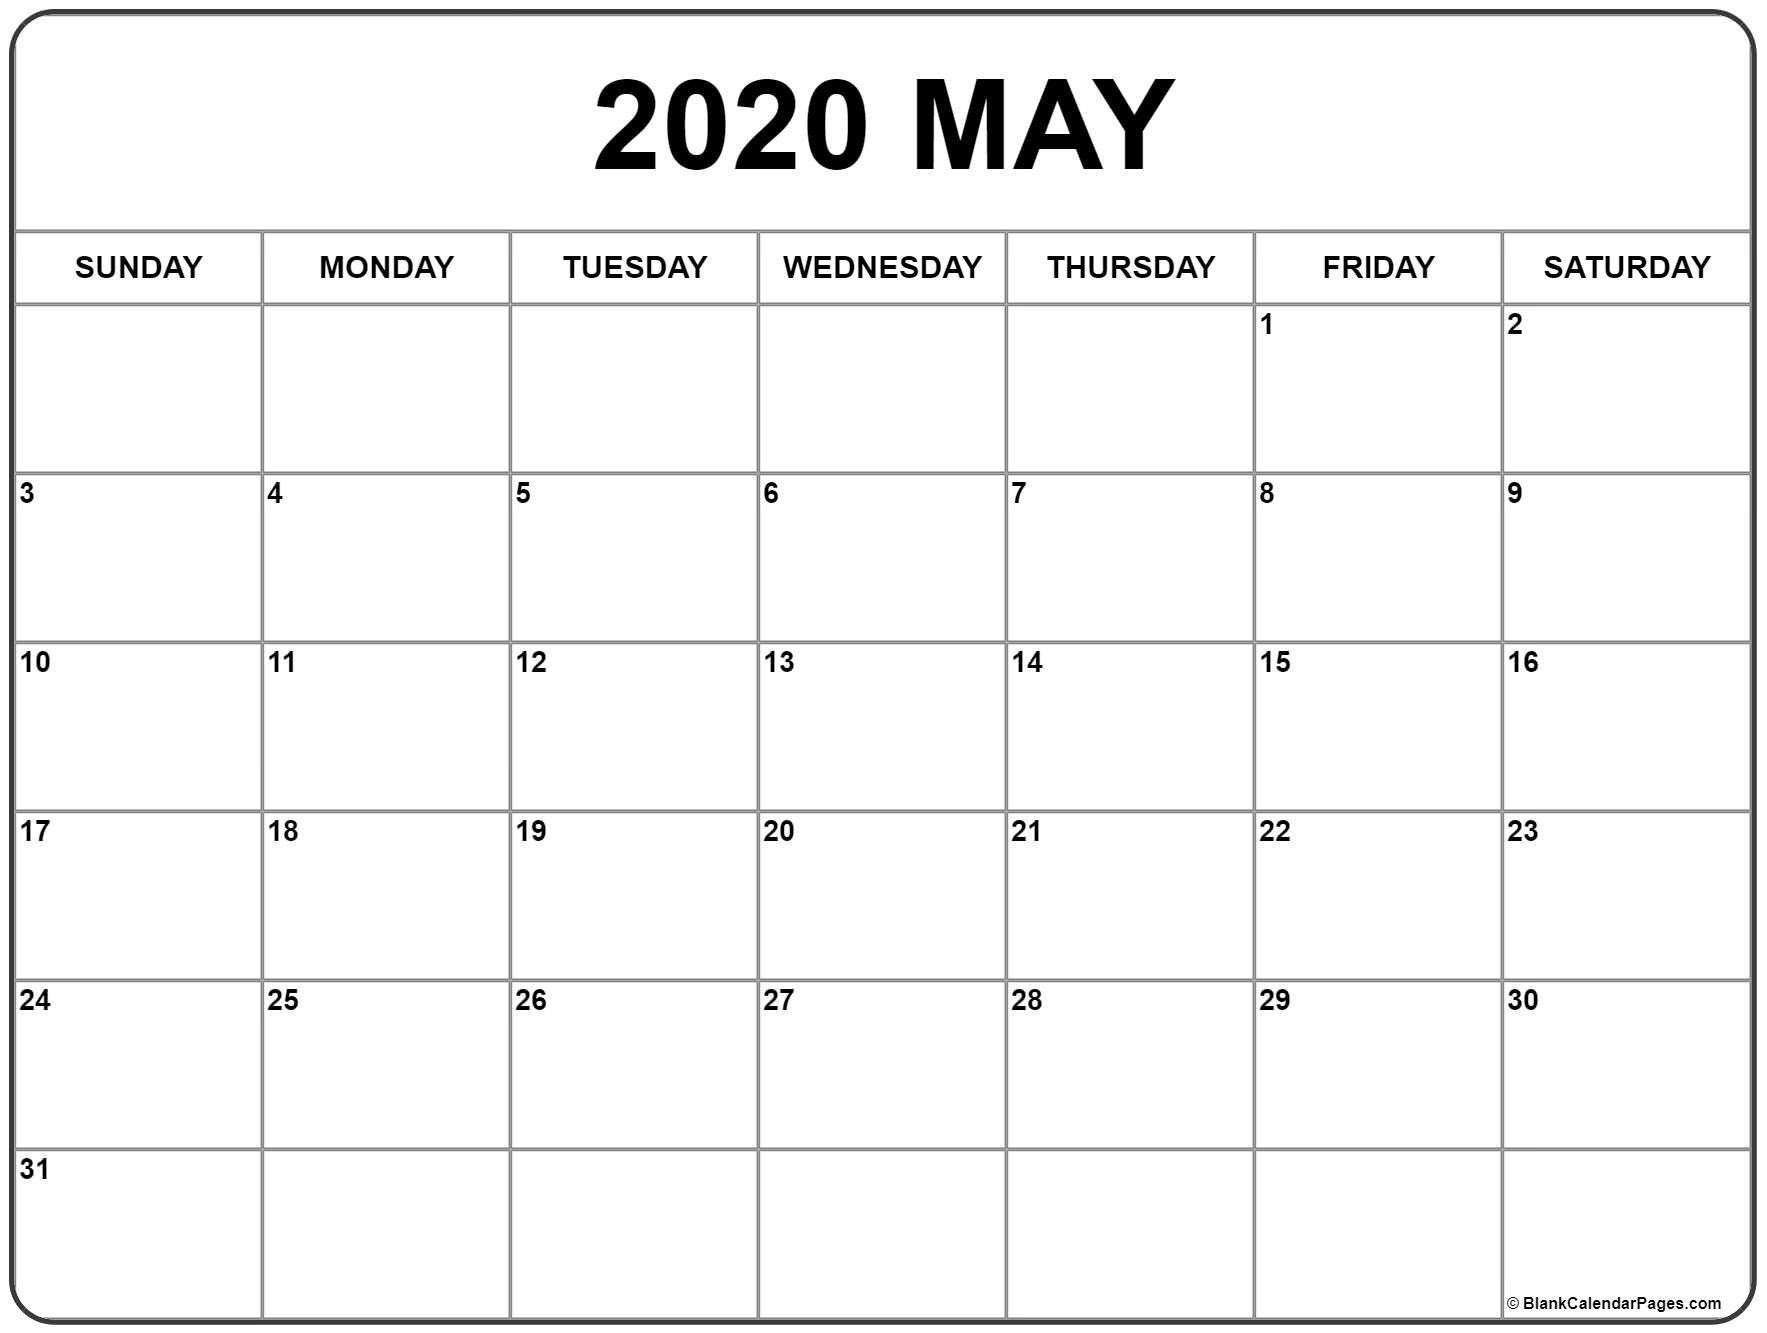 Large Numbers Free Printable Calendar 2020 - Calendar